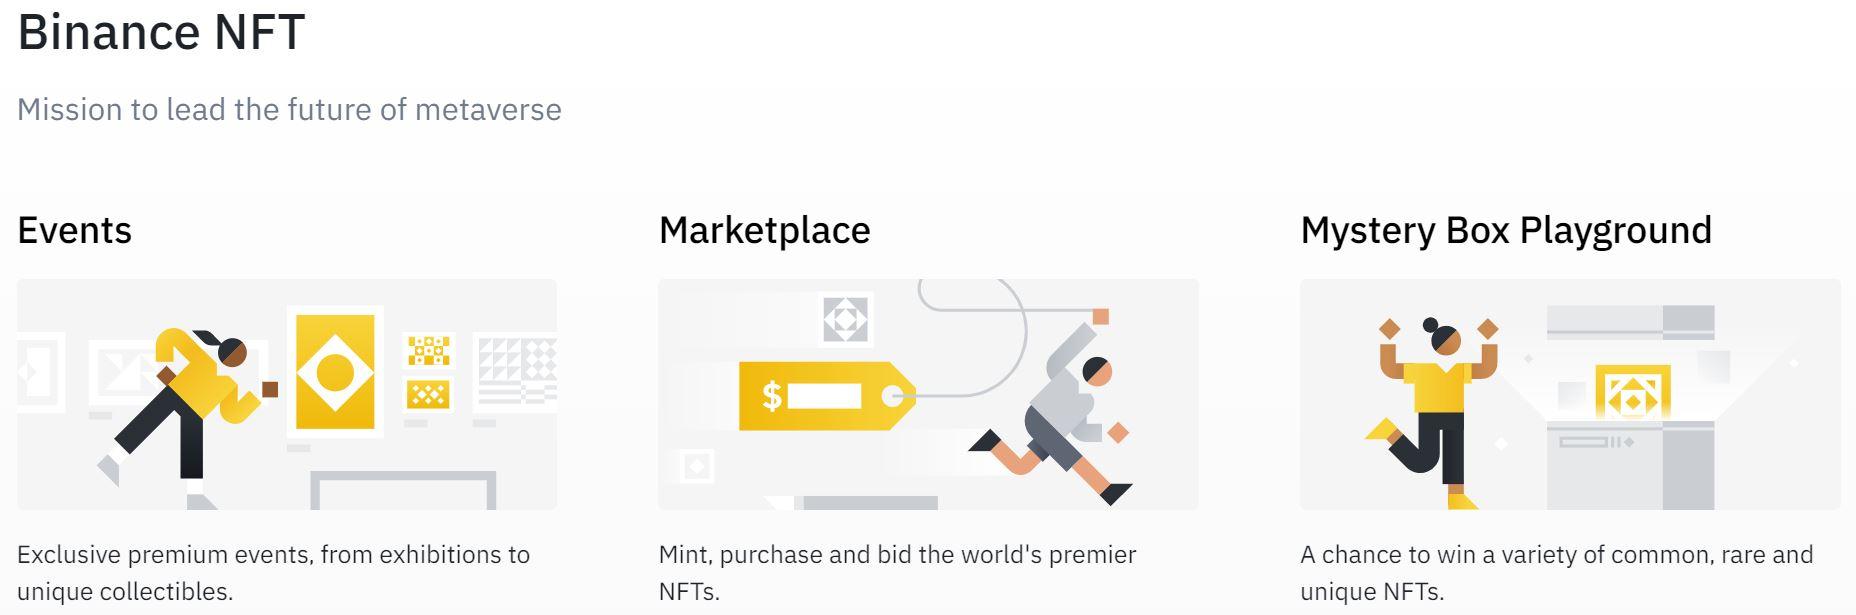 Binance NFT Marketplace Review